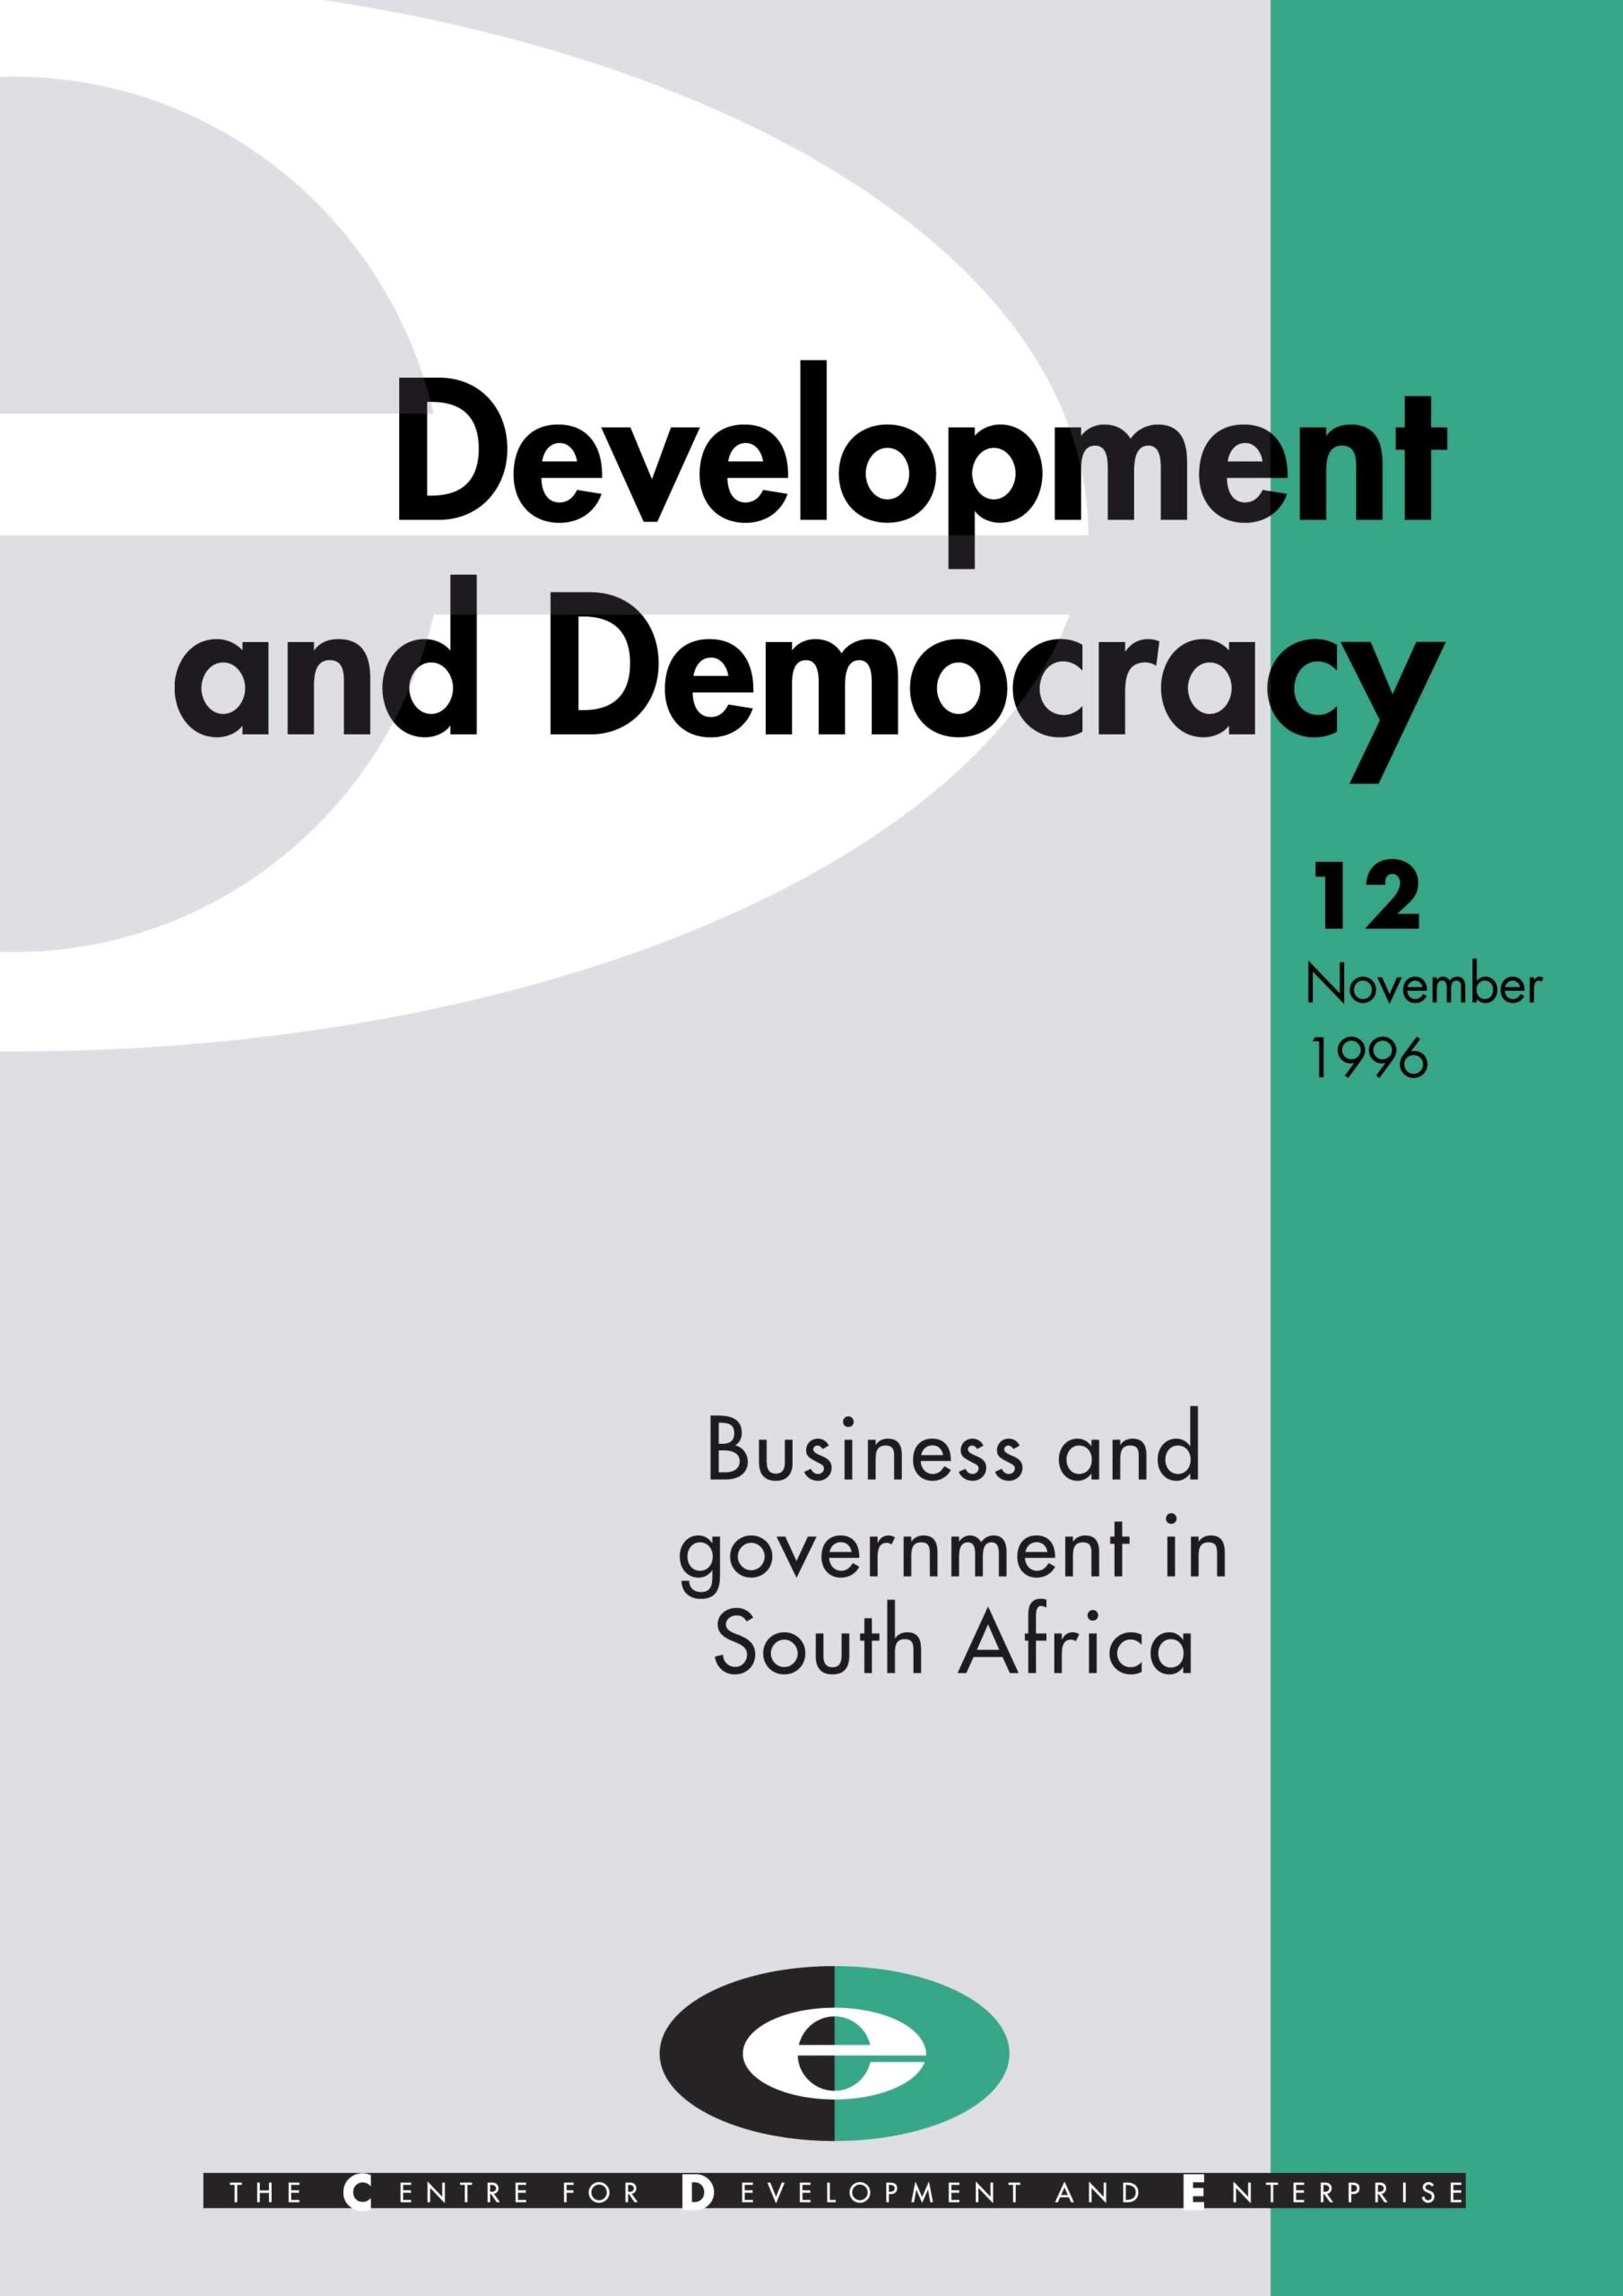 CDE development and democracy